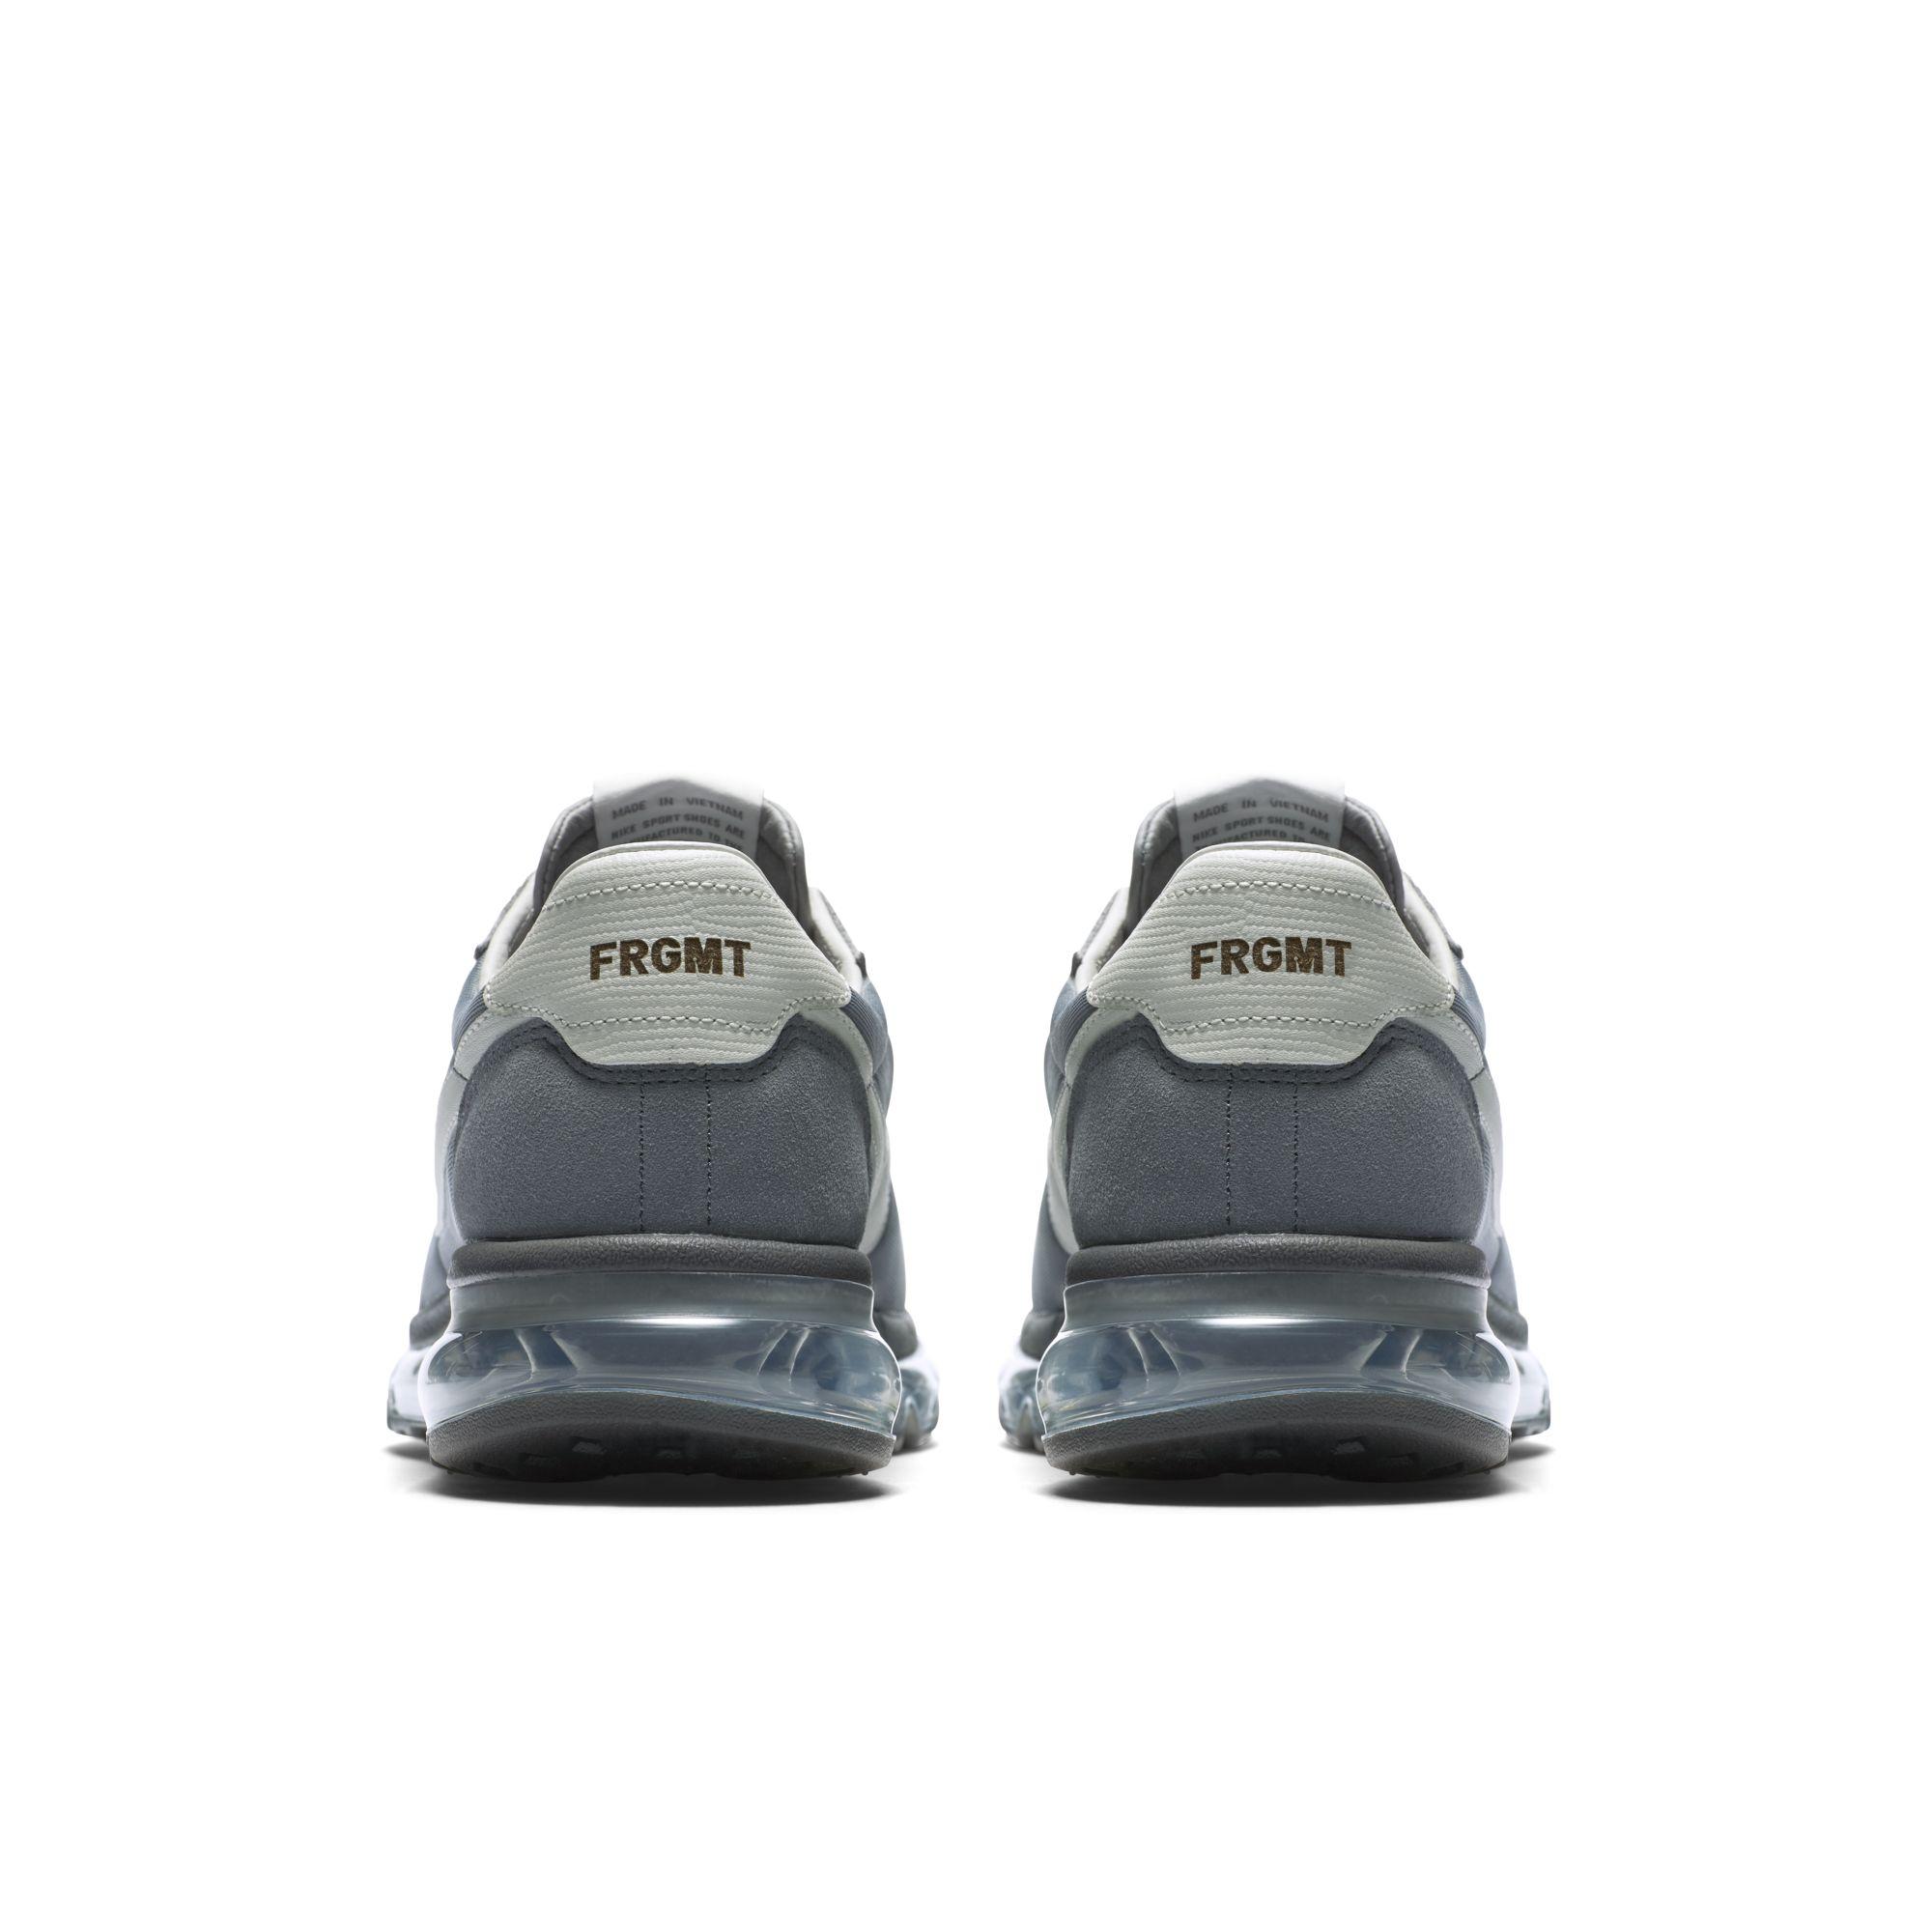 Air Max LTD 0 Fragment  – Grey – Heel